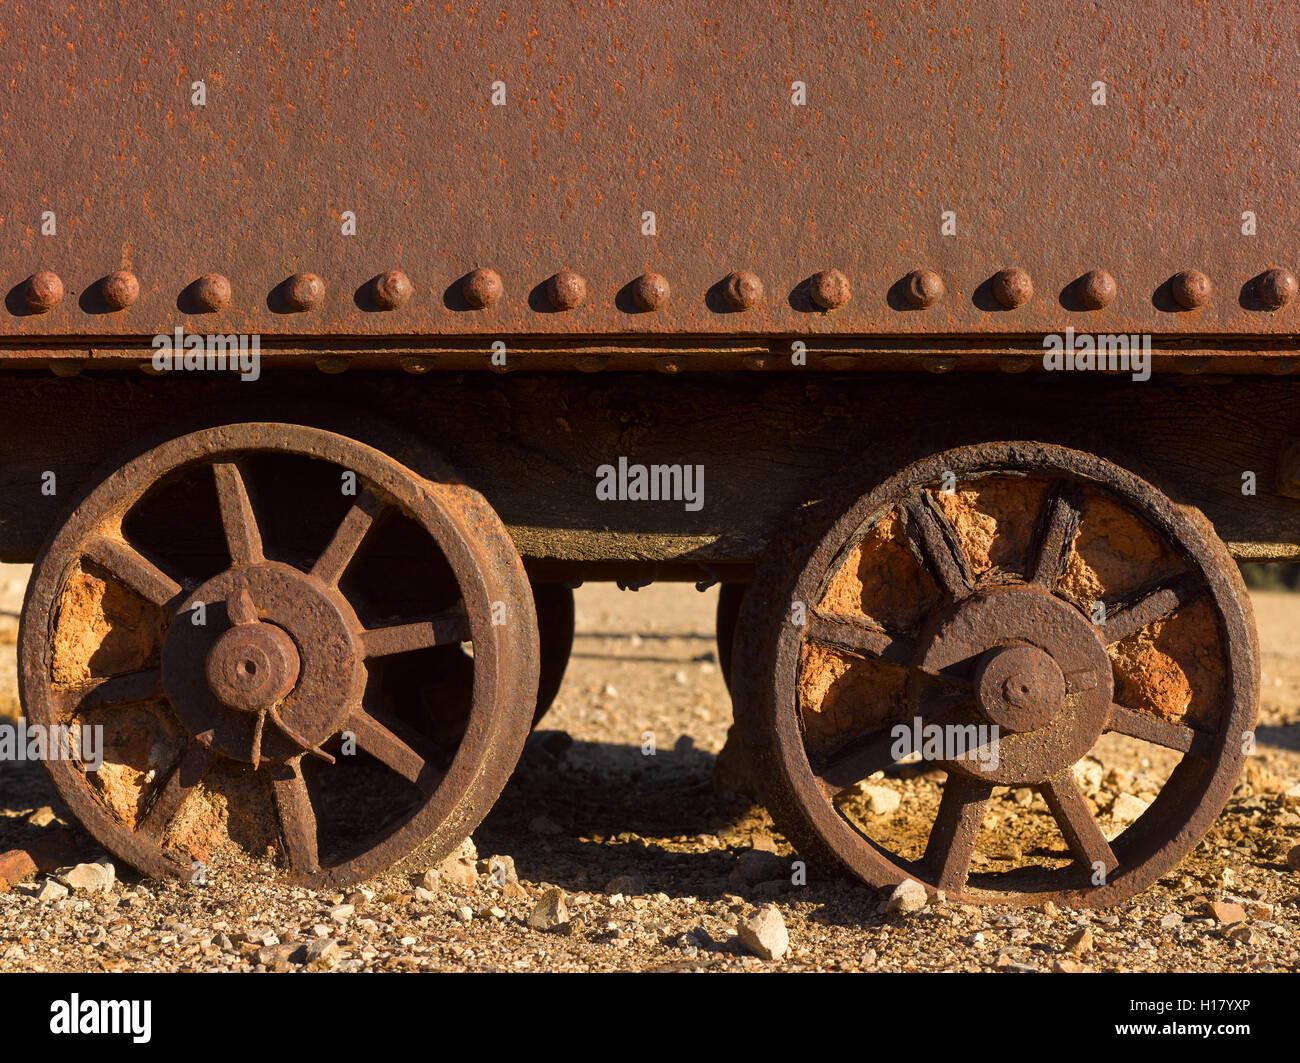 Historic Freight Rail Stock Photos & Historic Freight Rail Stock ...